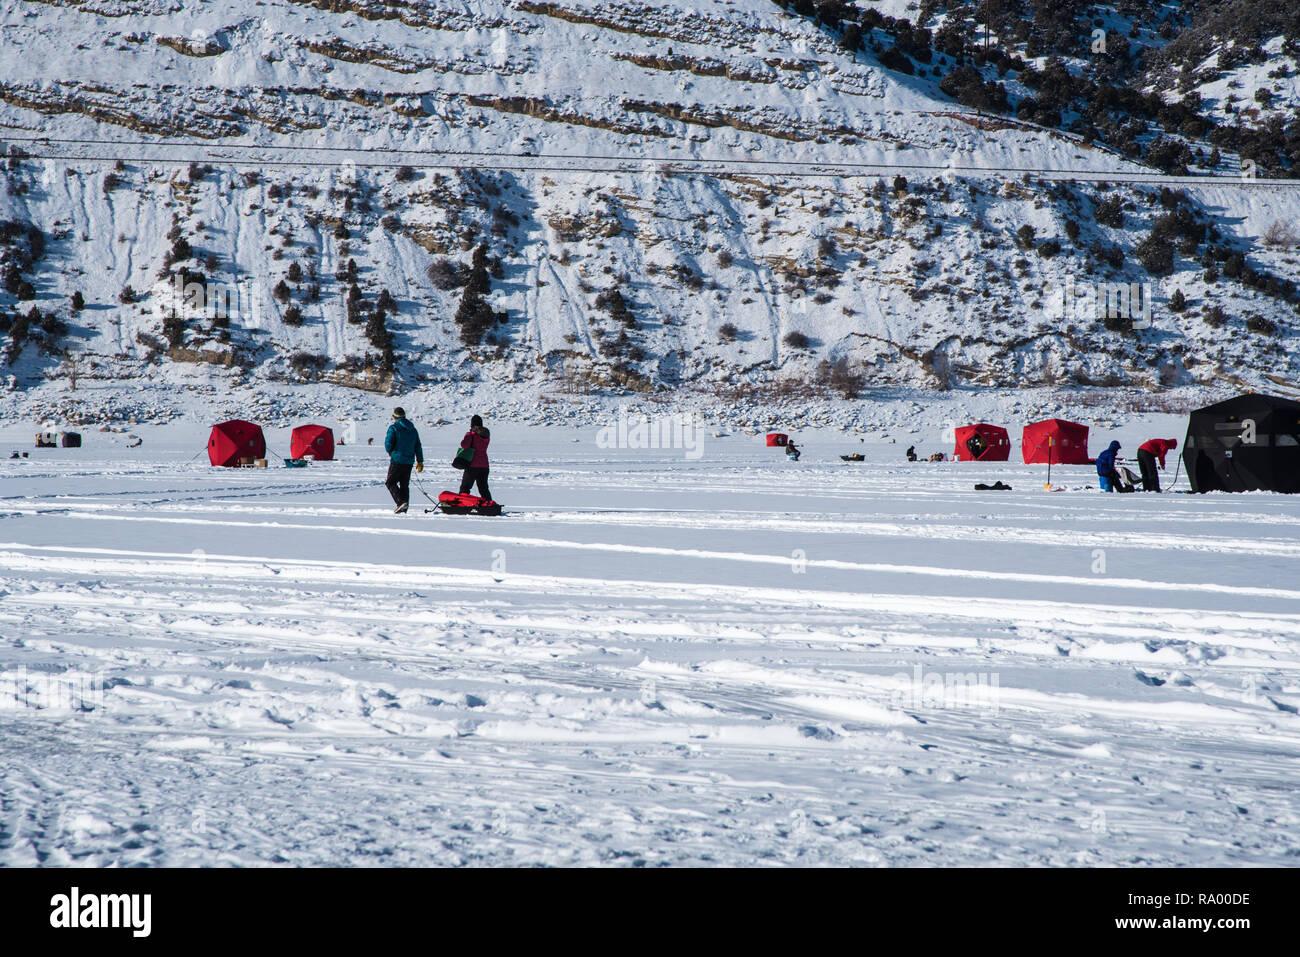 Ice fisherman on a frozen lake. - Stock Image